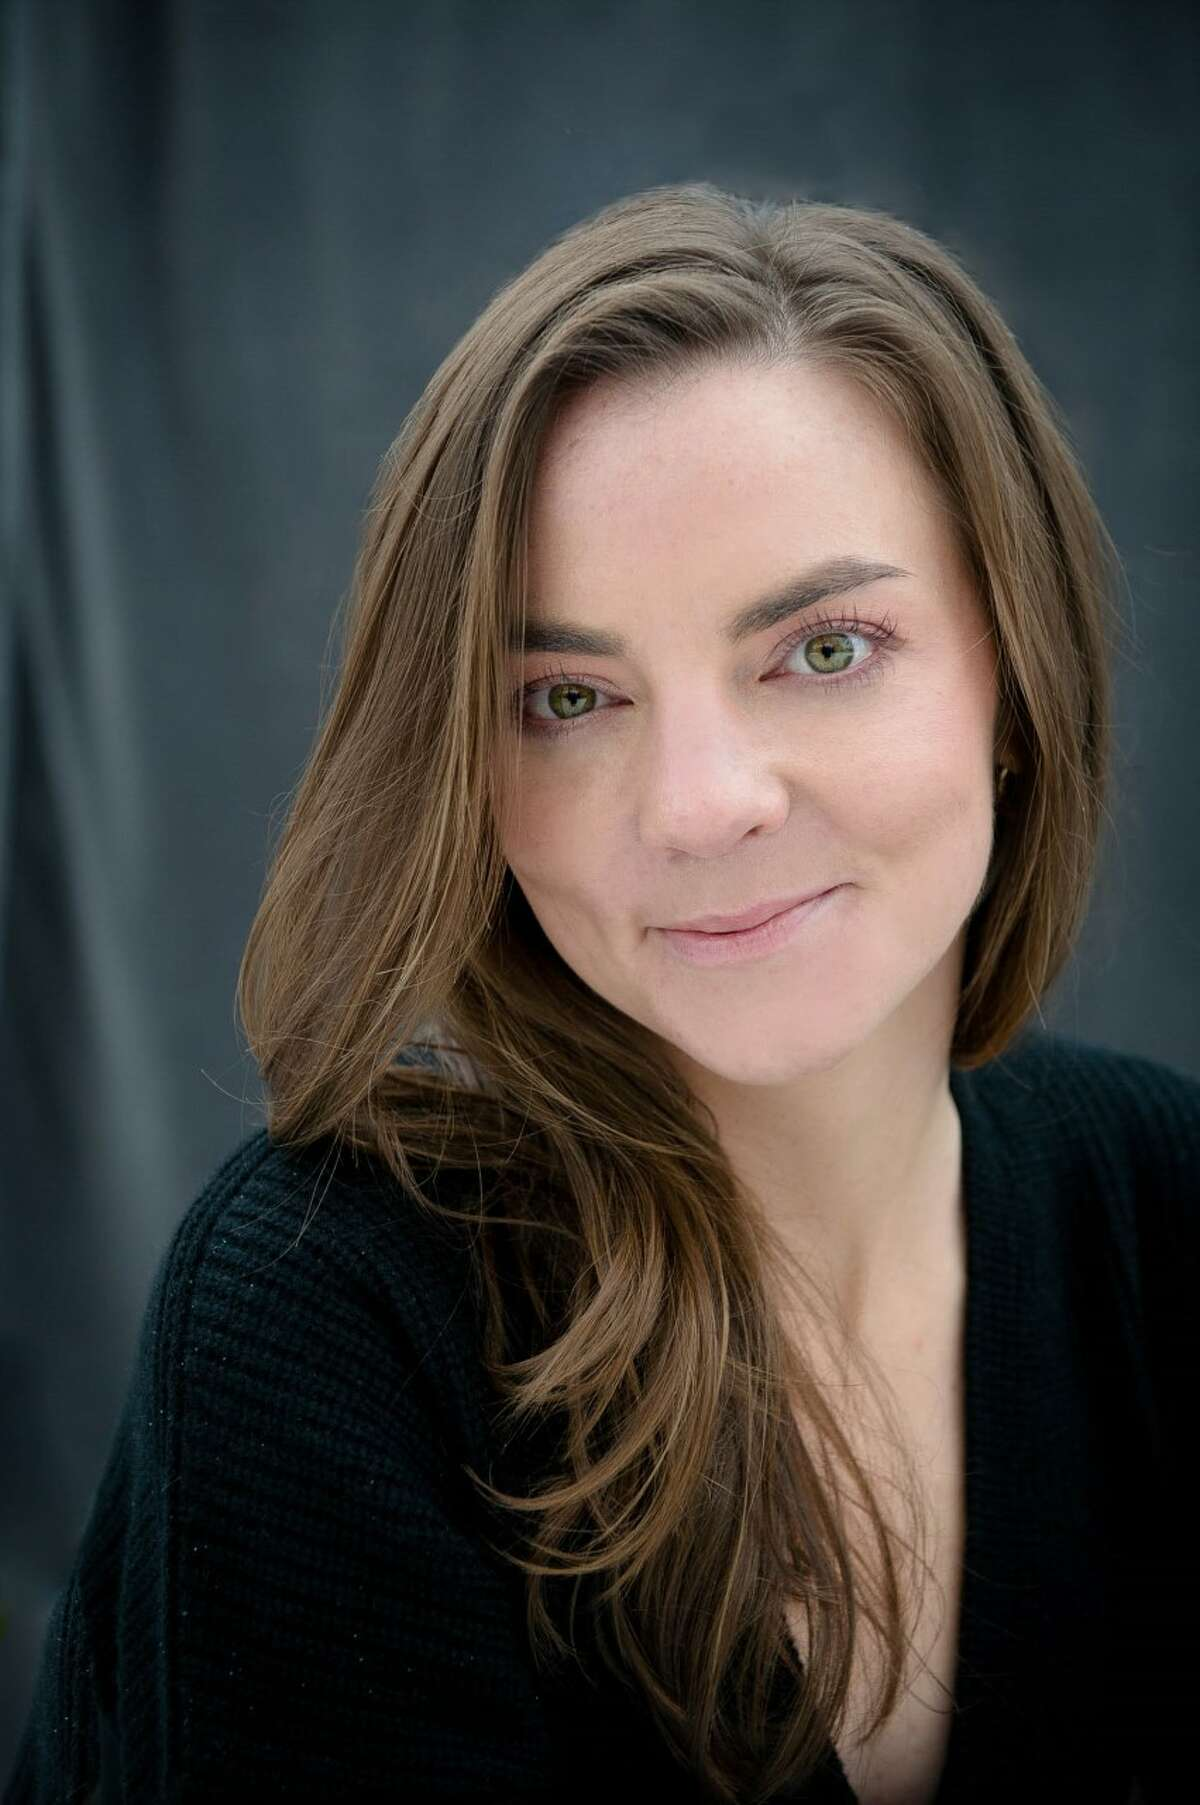 Emily Layden (Credit: Emma Dodge Hanson)